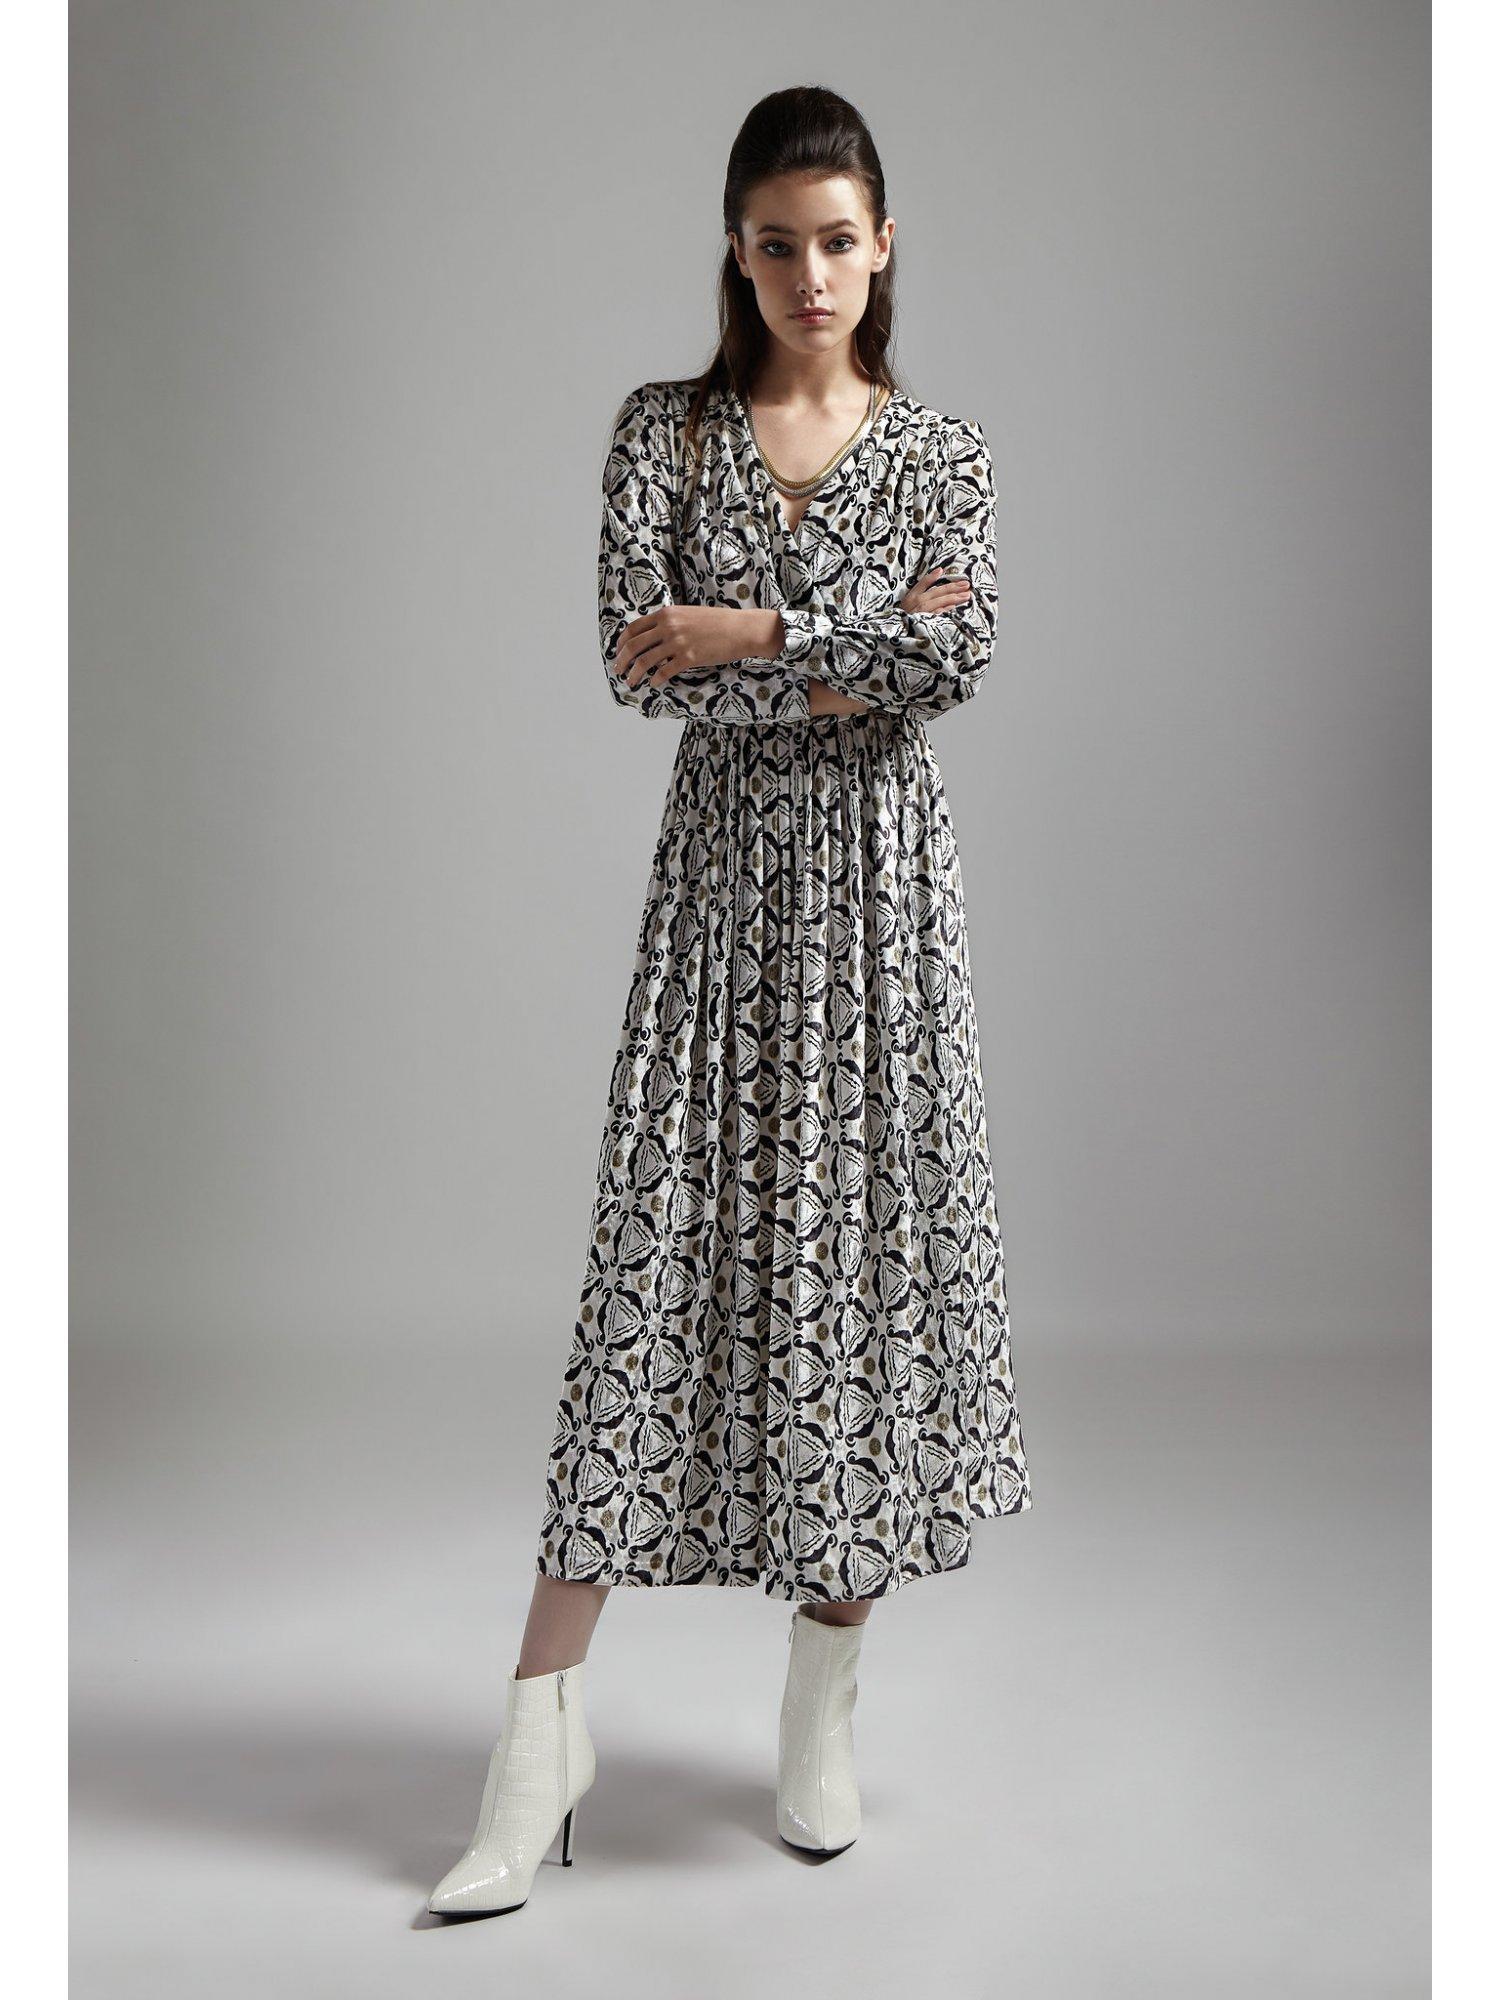 ERYTHEIS DRESS